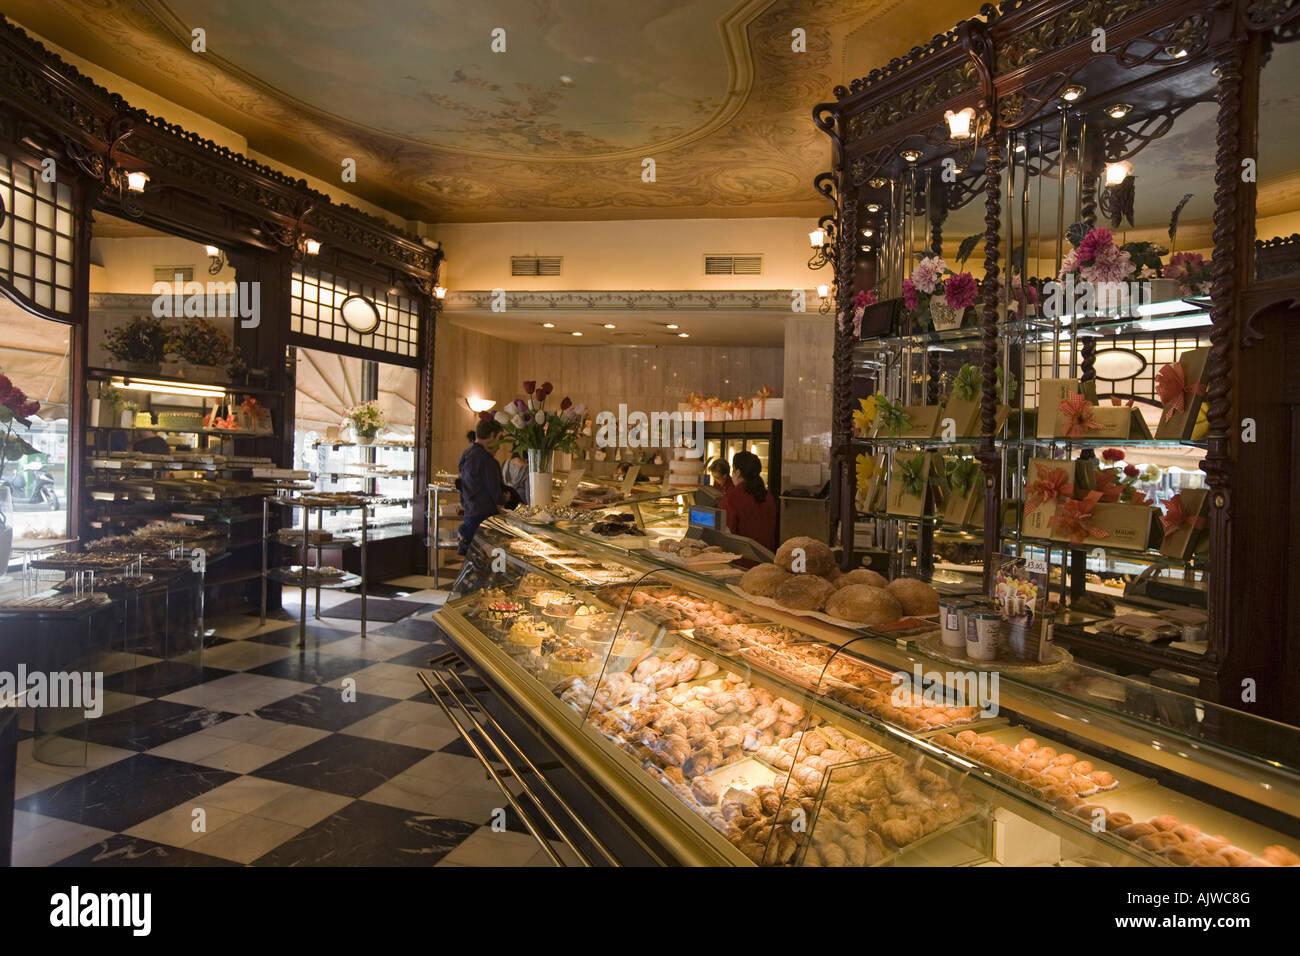 barcelona cafe mauri interieur